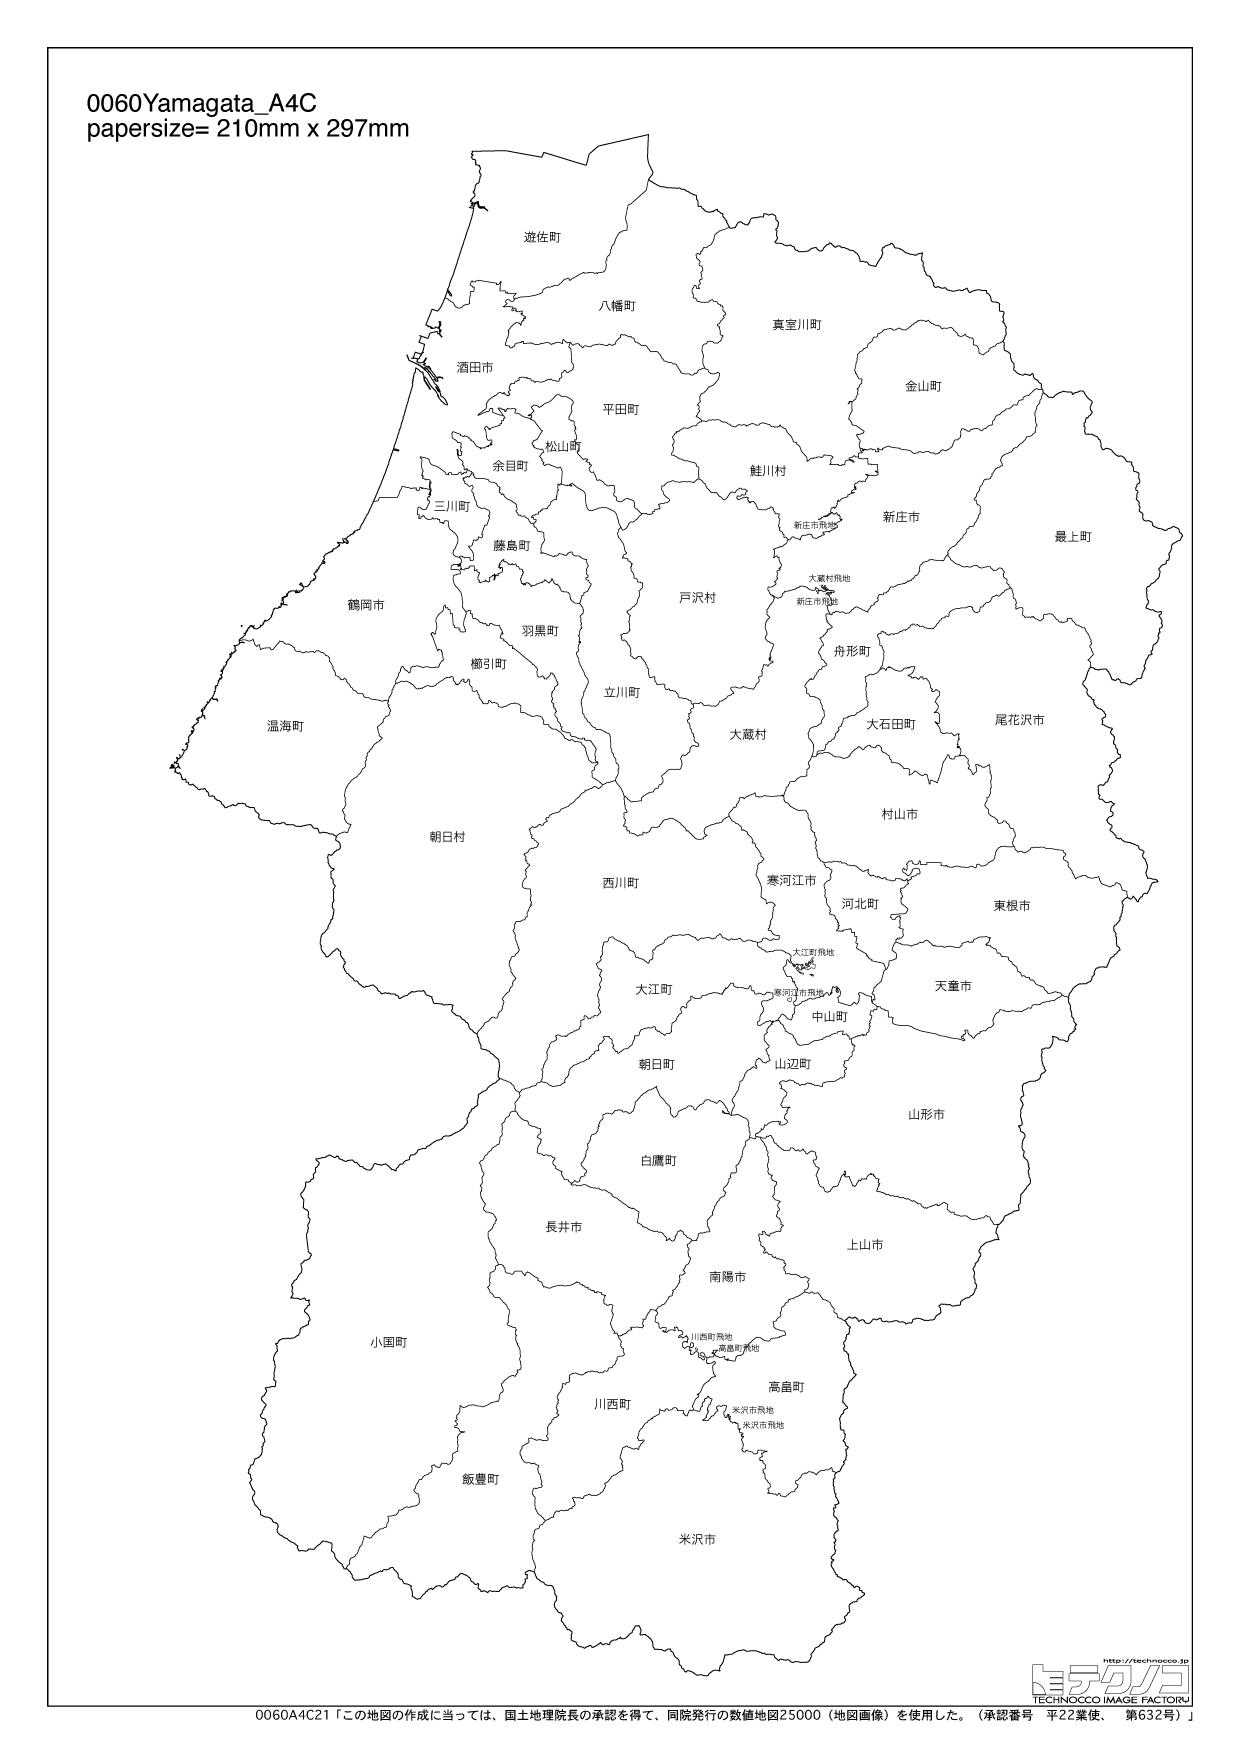 map 2 with 2134991927351655003 on 5629580491 likewise 2134991927351655003 likewise 3511839192 additionally Gogokuji Map besides P4 Map.